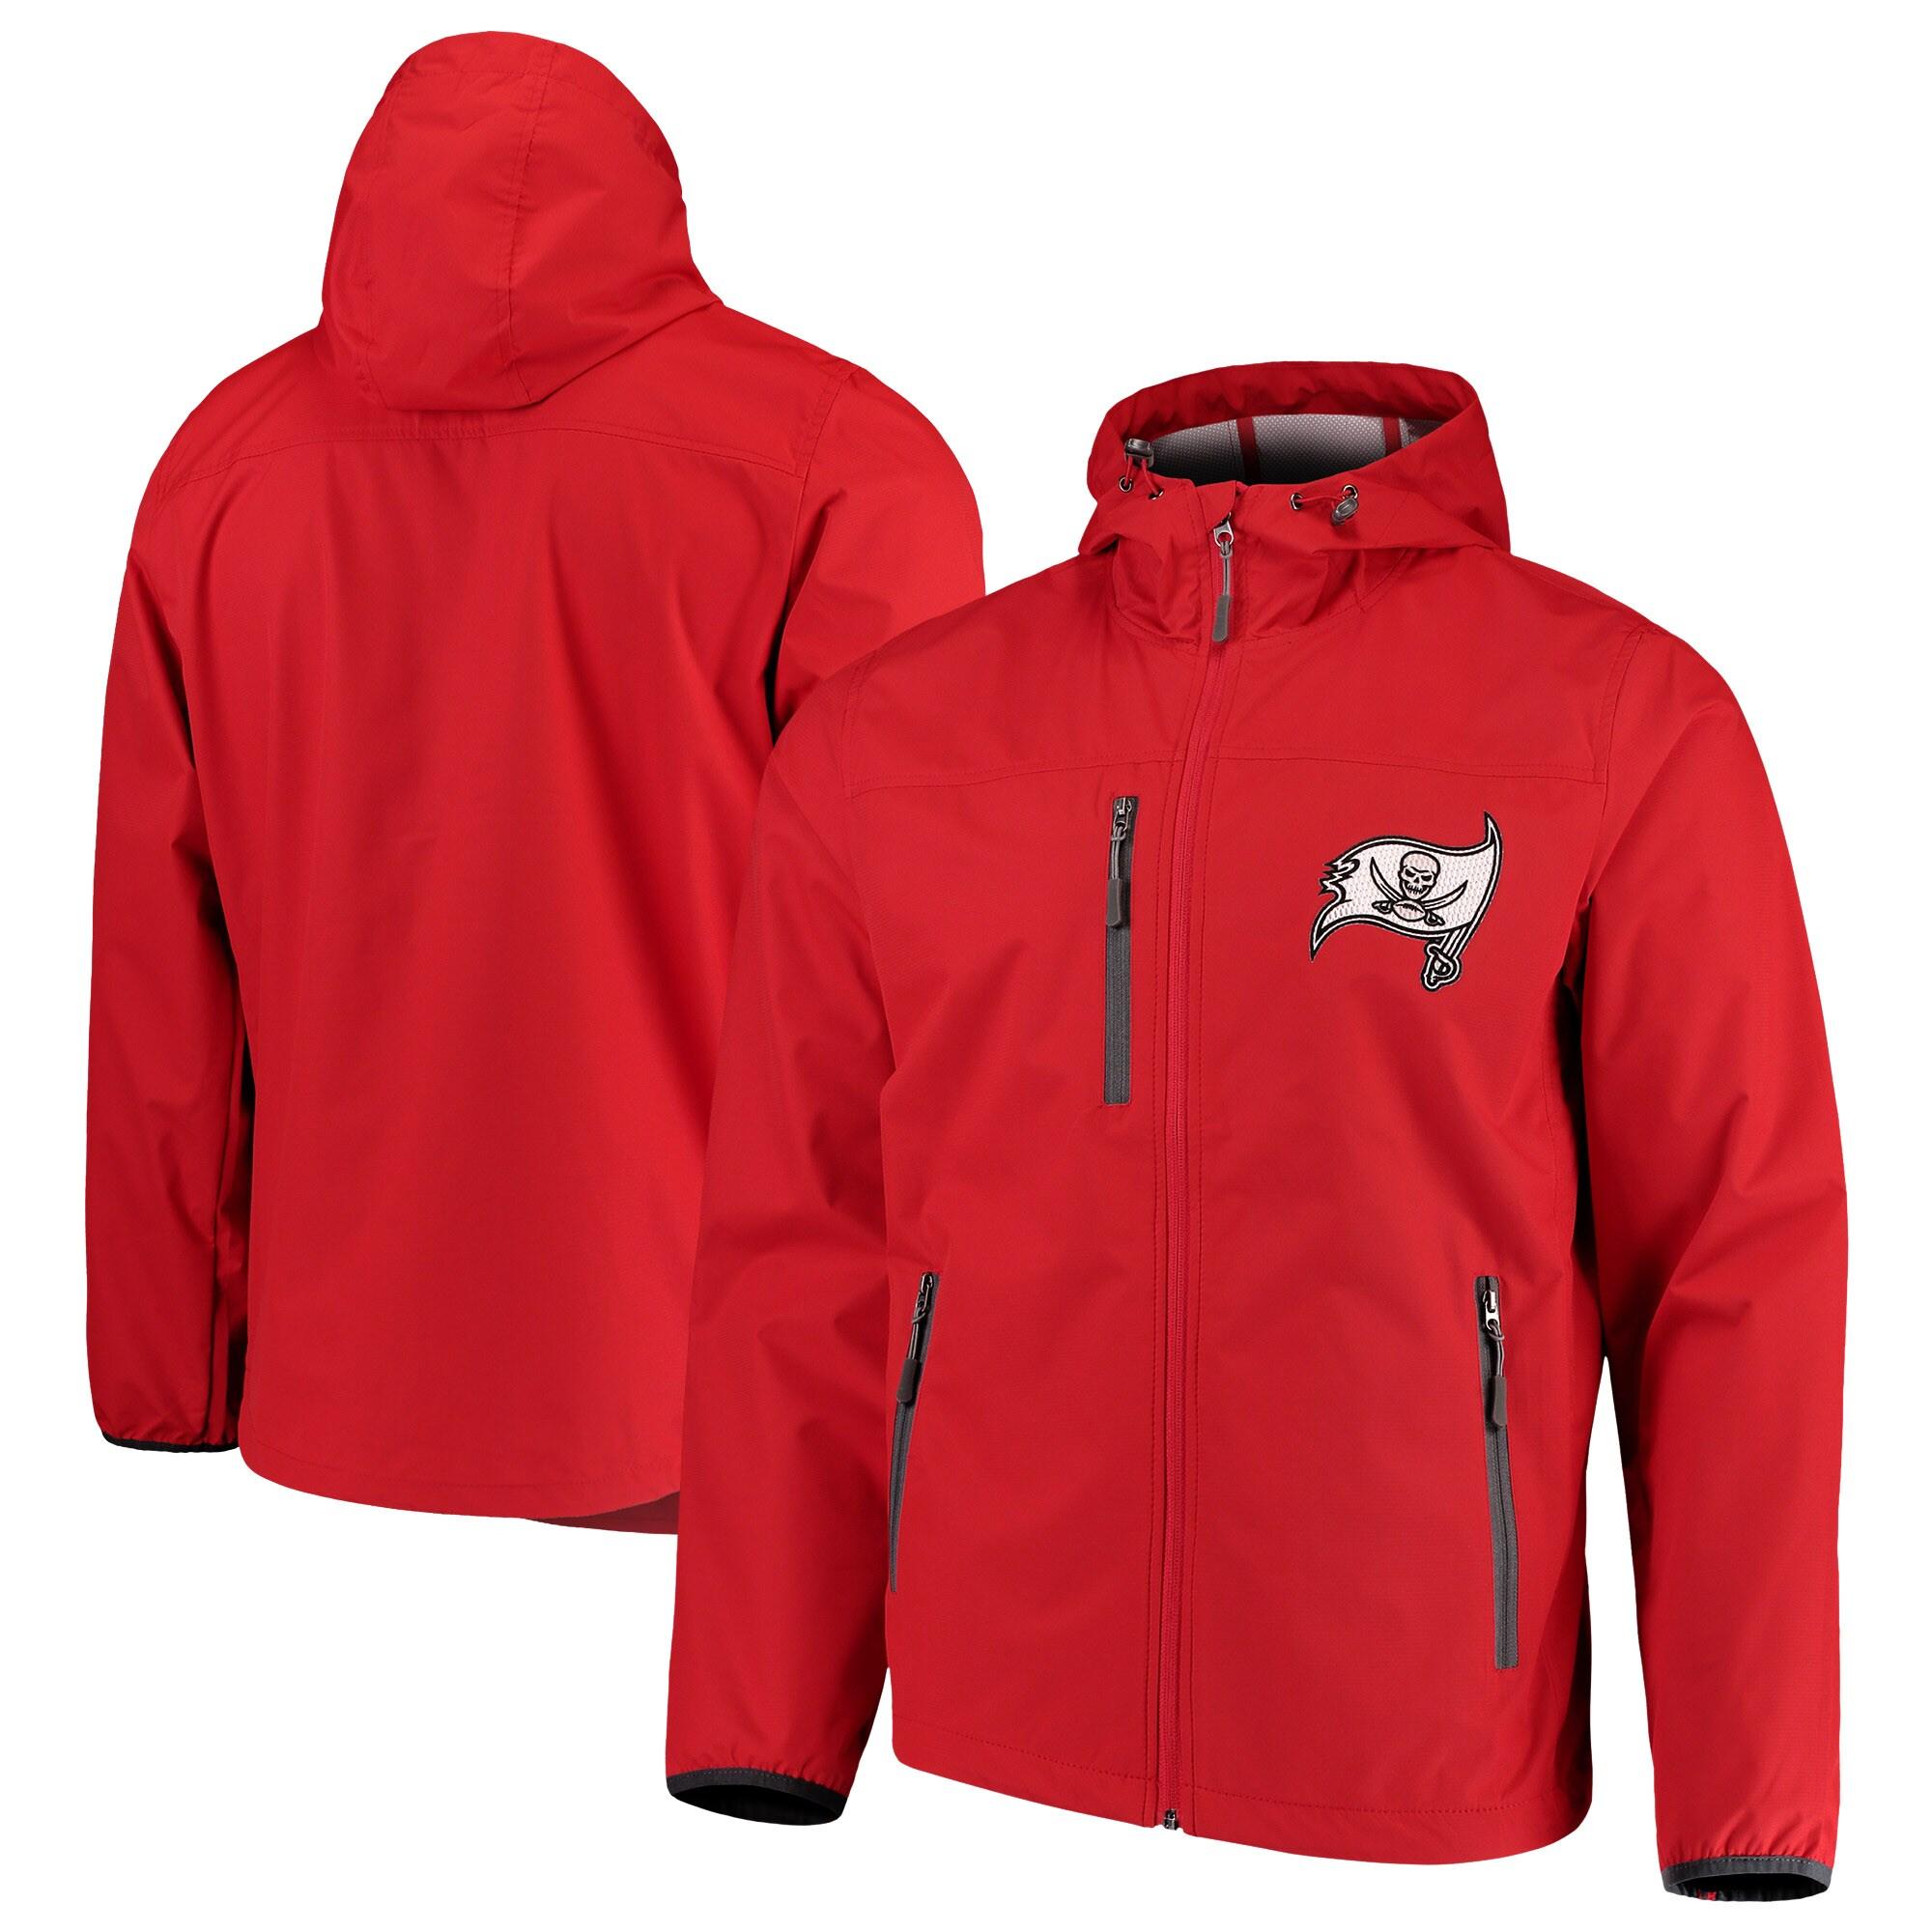 Tampa Bay Buccaneers G-III Sports by Carl Banks Trick Play Full-Zip Hooded Jacket - Red